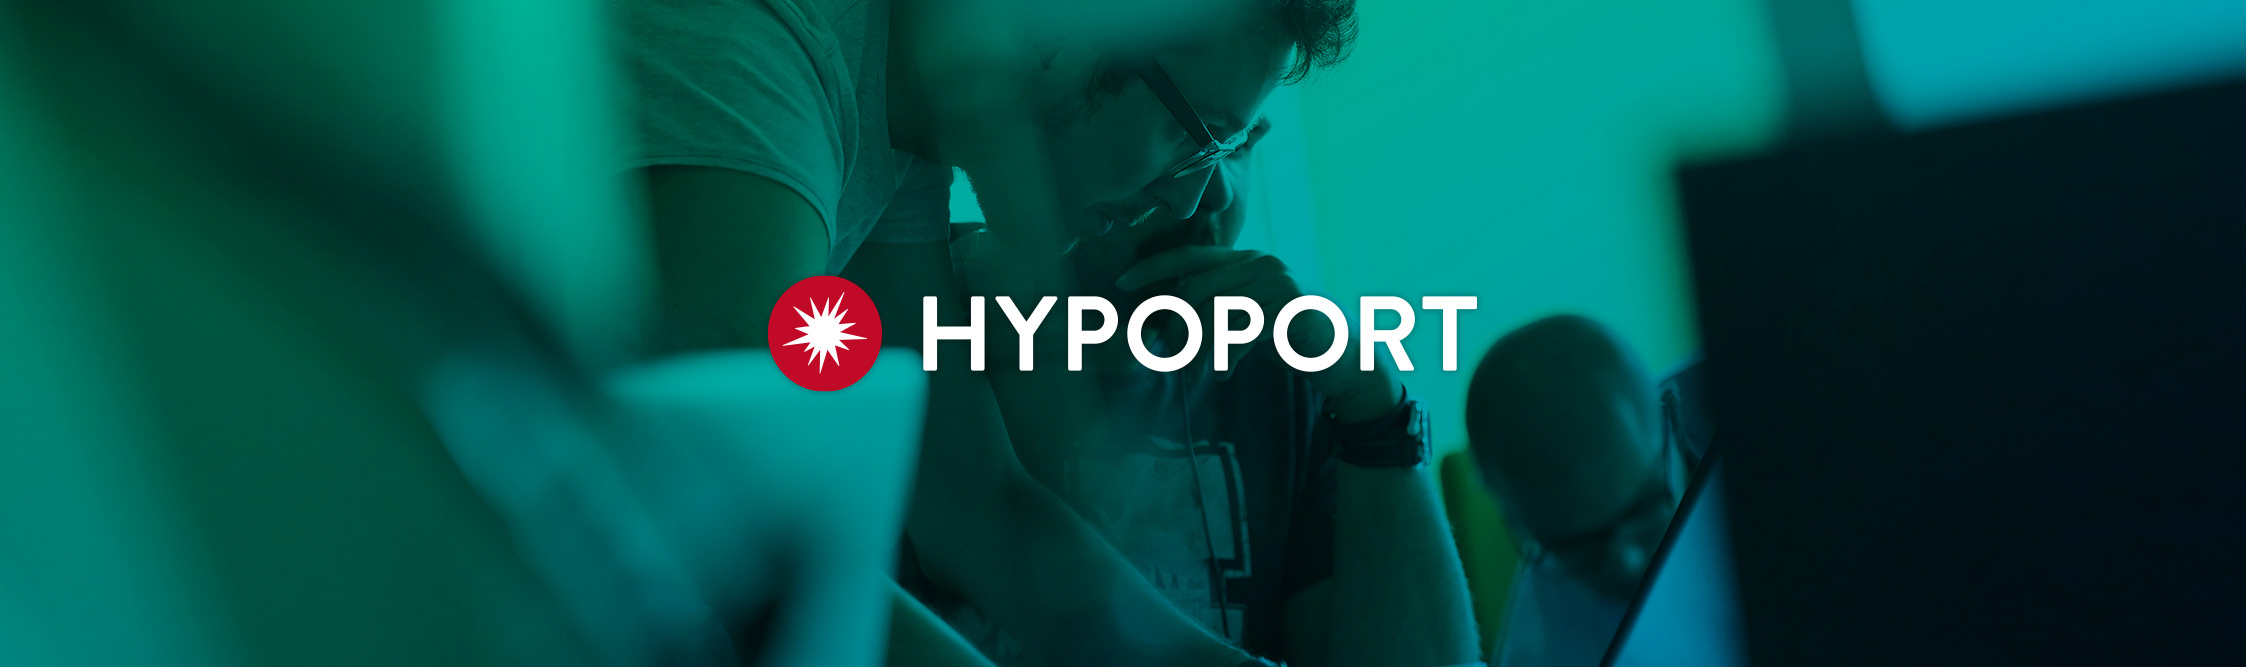 Hypoport SE